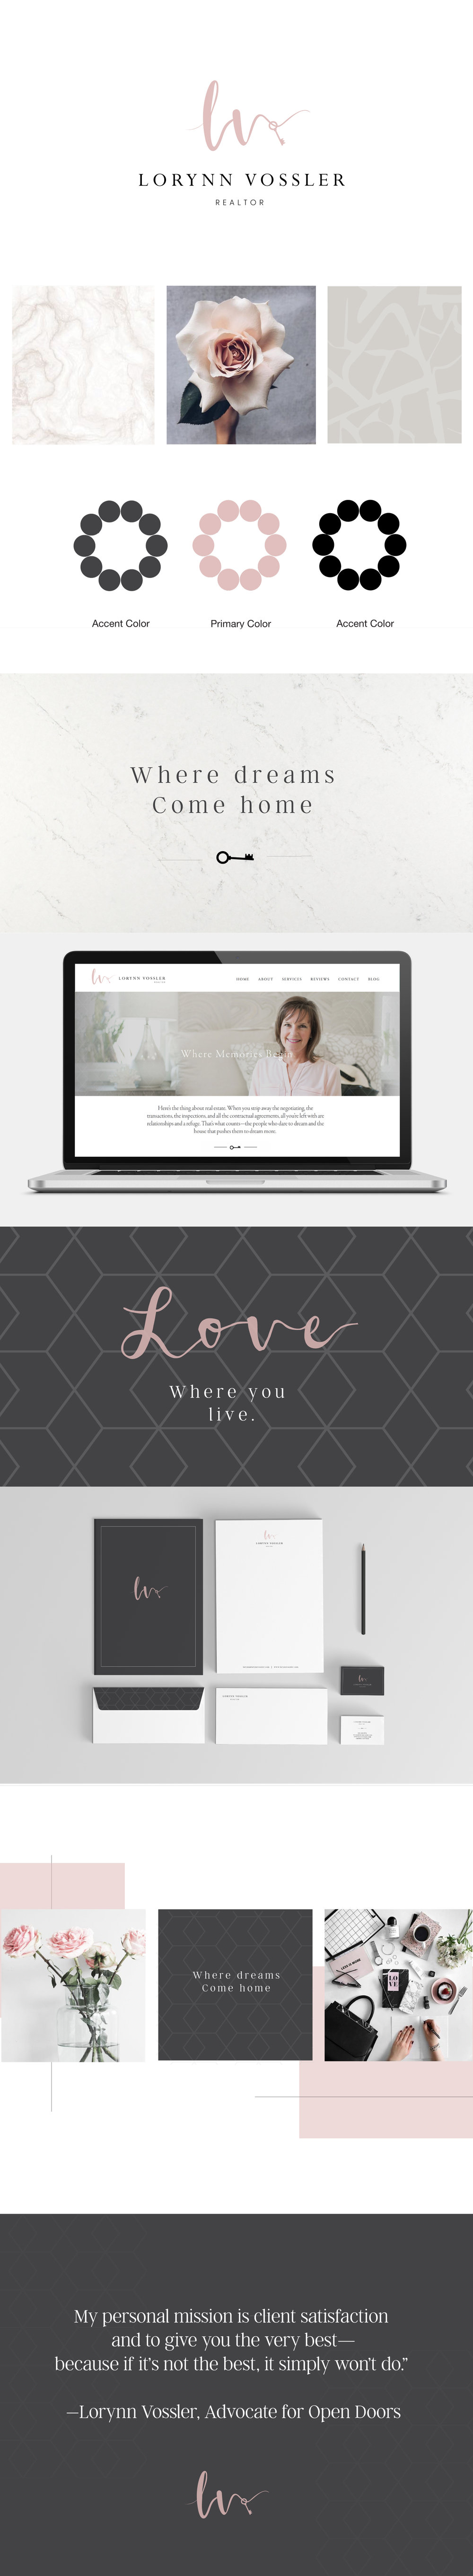 Lorynn-Vossler-Design.jpg